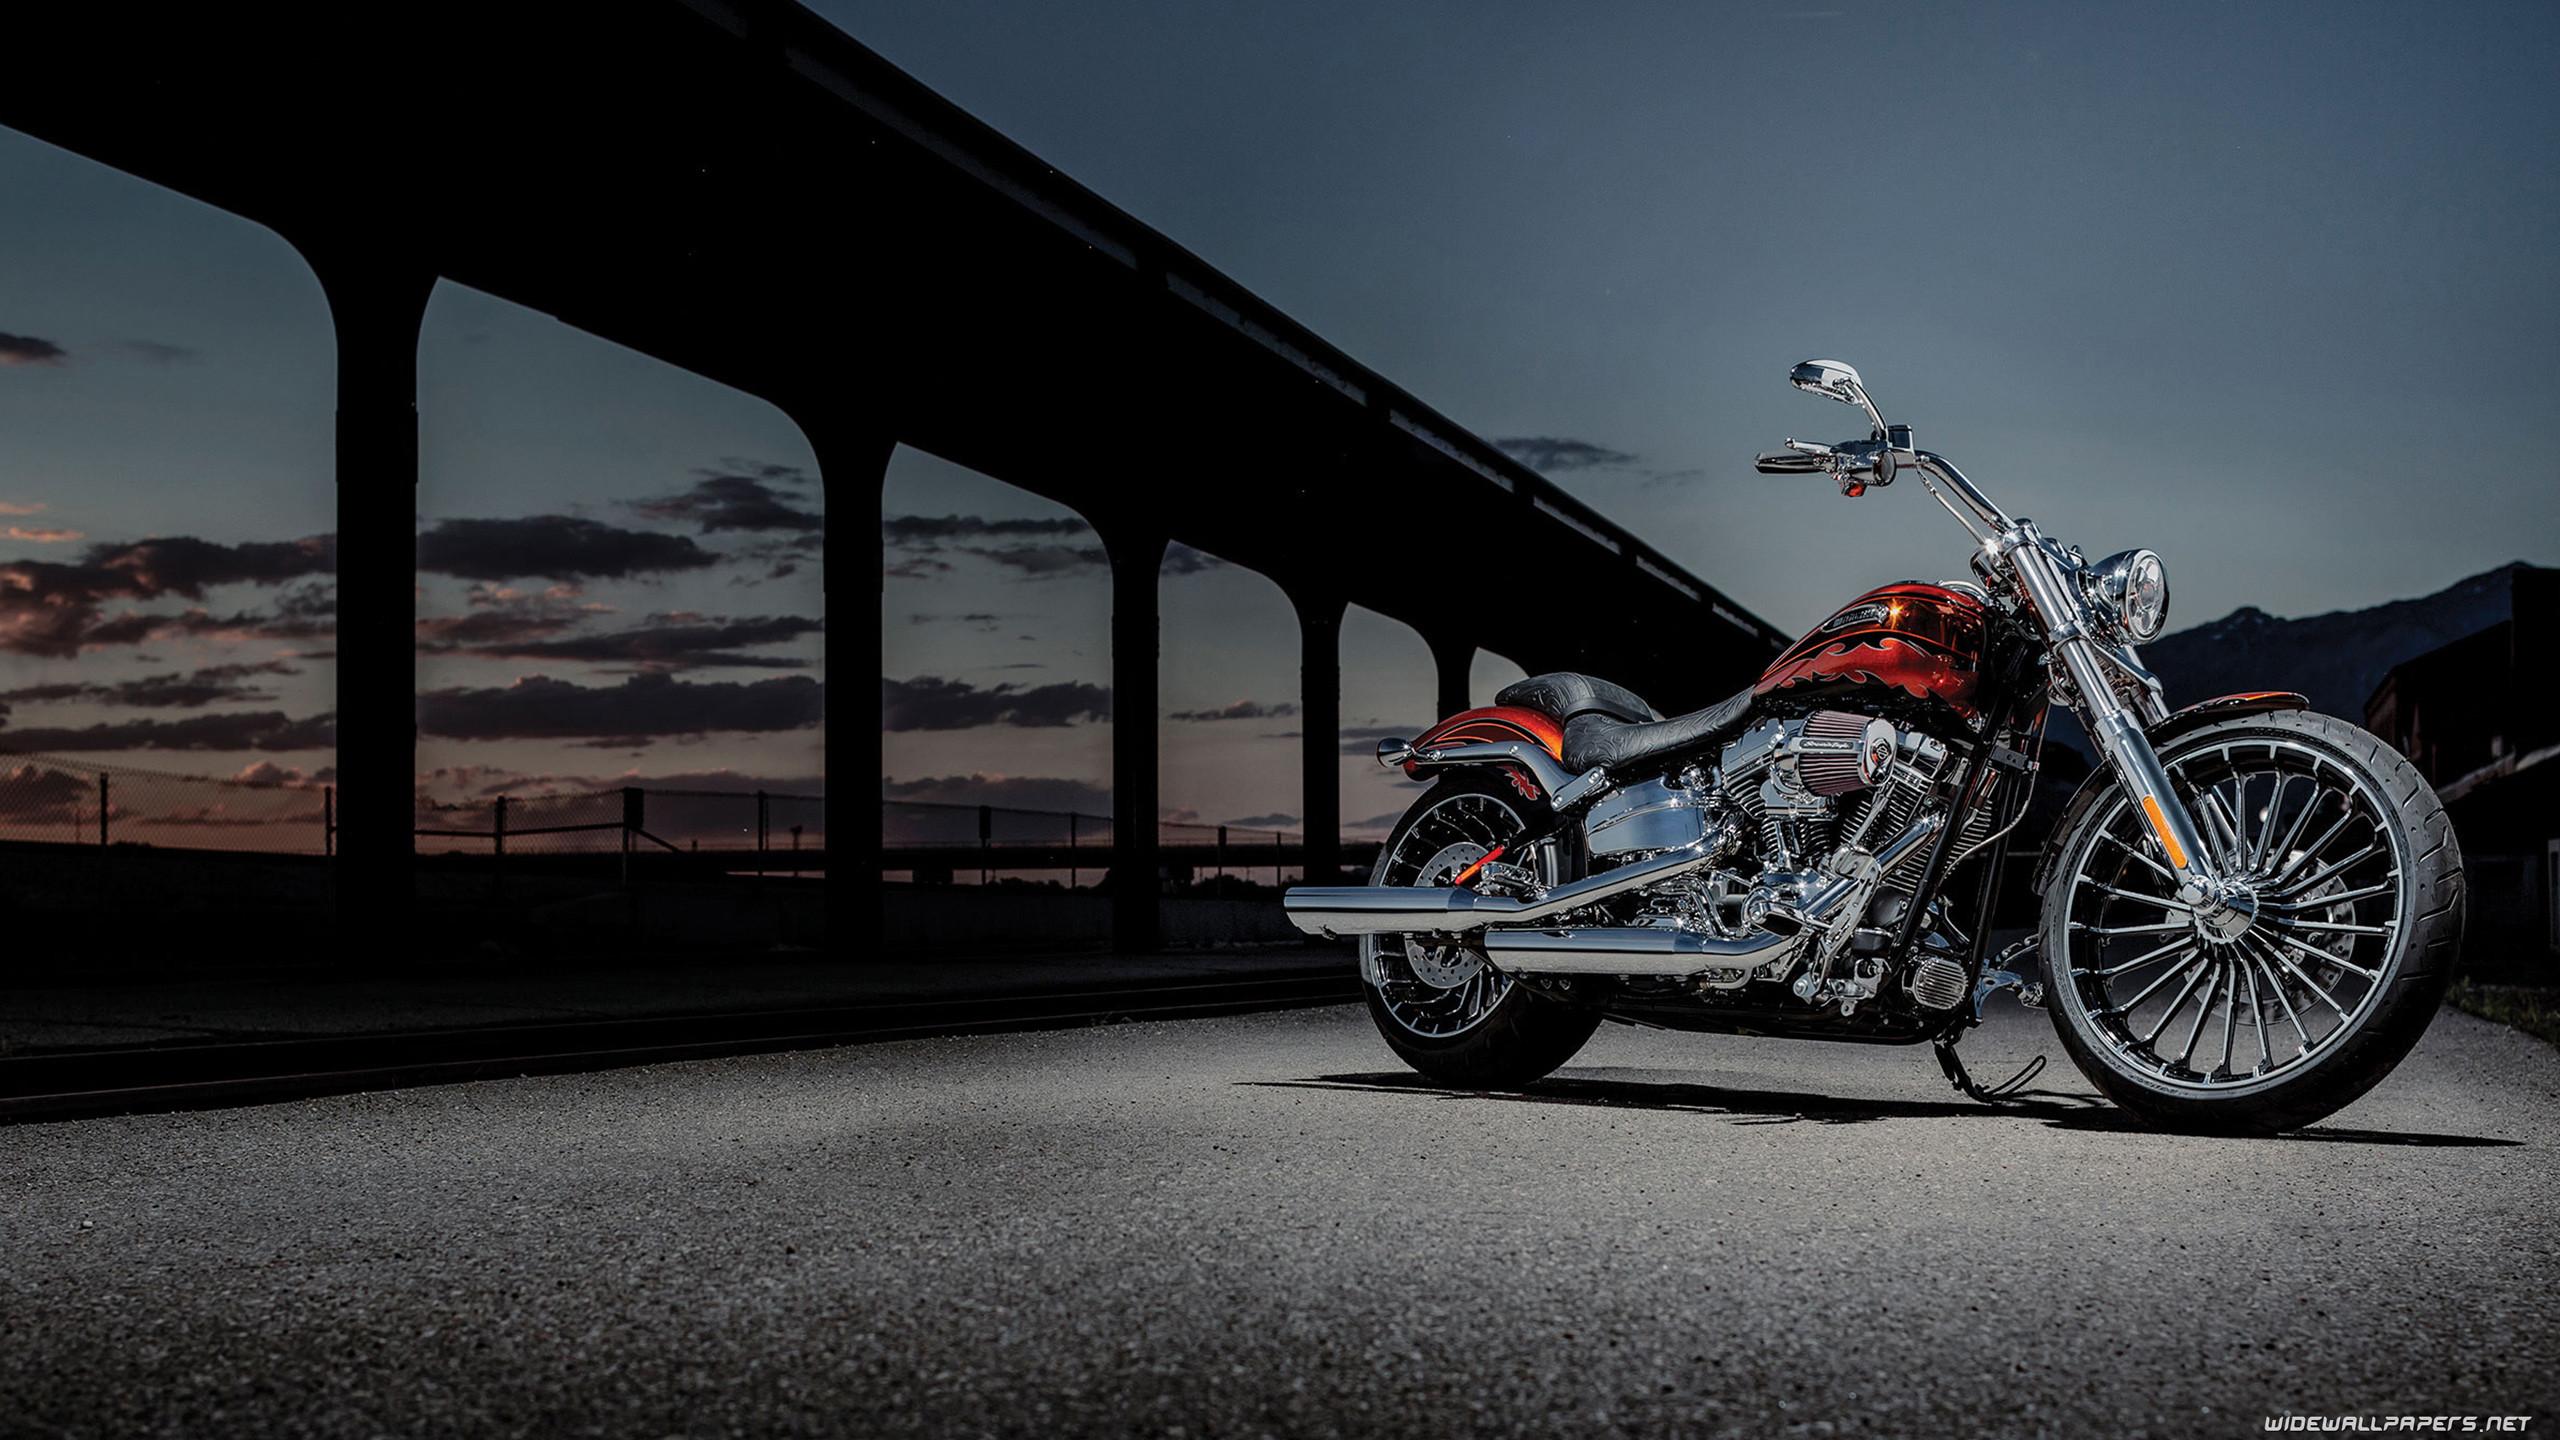 Harley Davidson Wallpaper HD (74+ Images